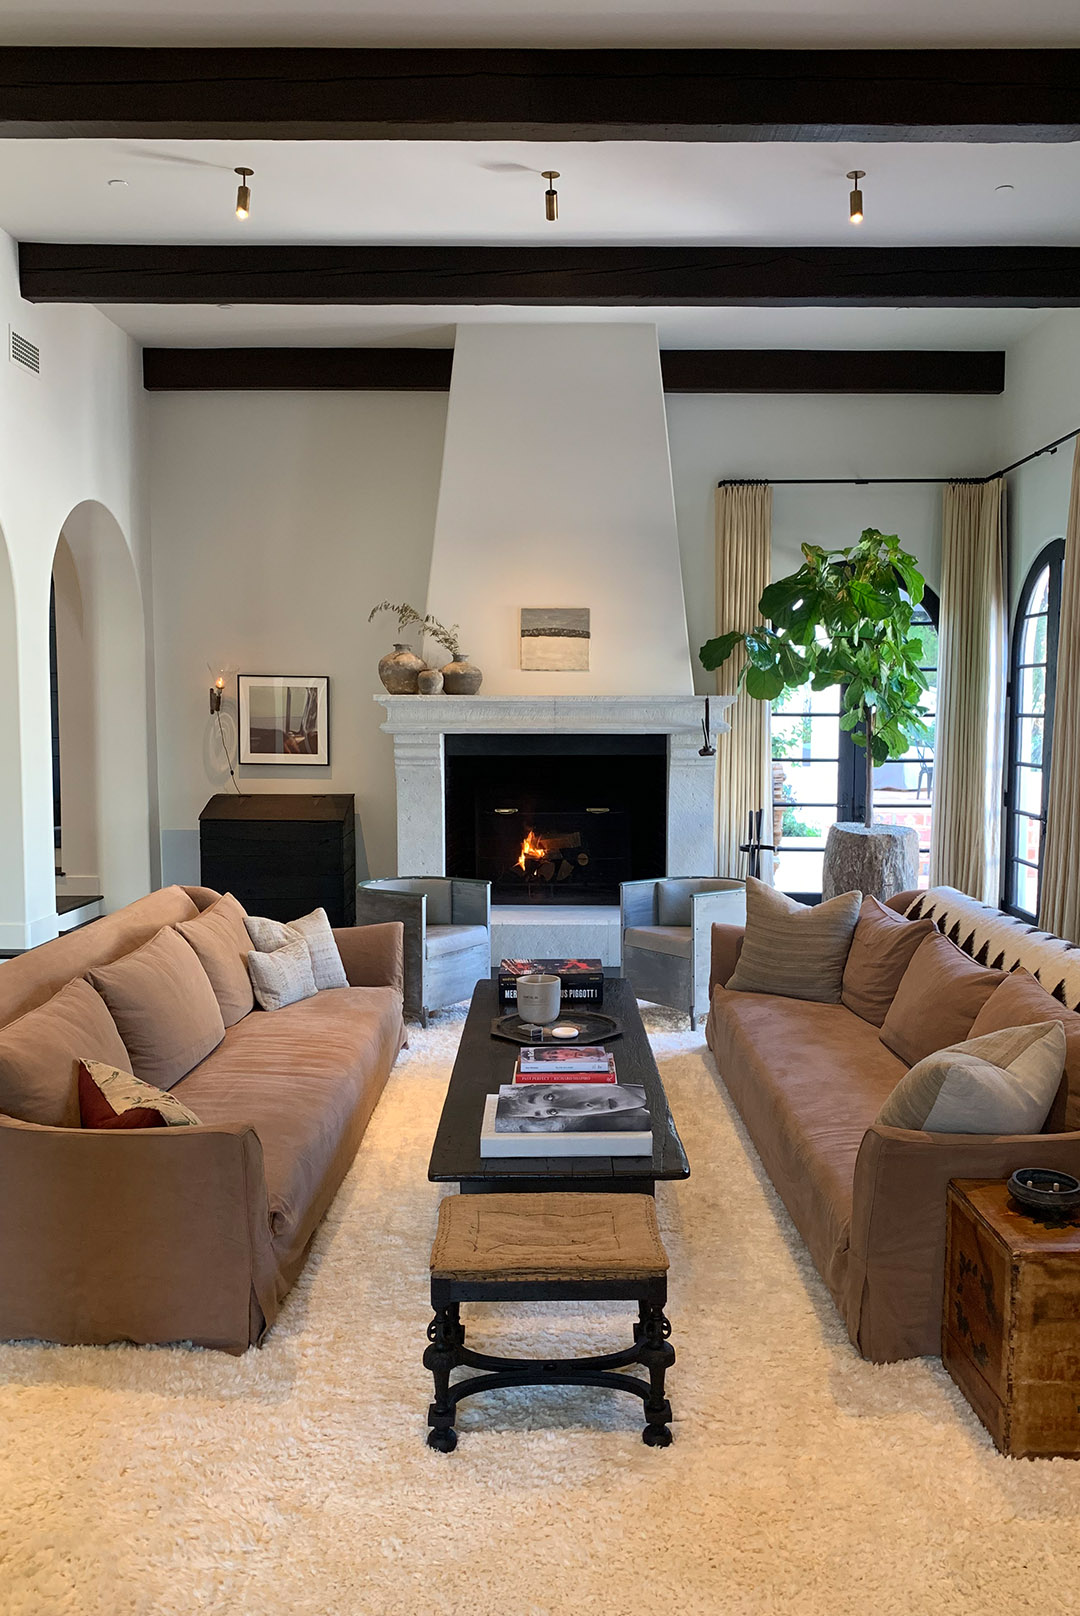 HOW TO RECREATE KENDALL'S <em>Living Room for Under $100</em>